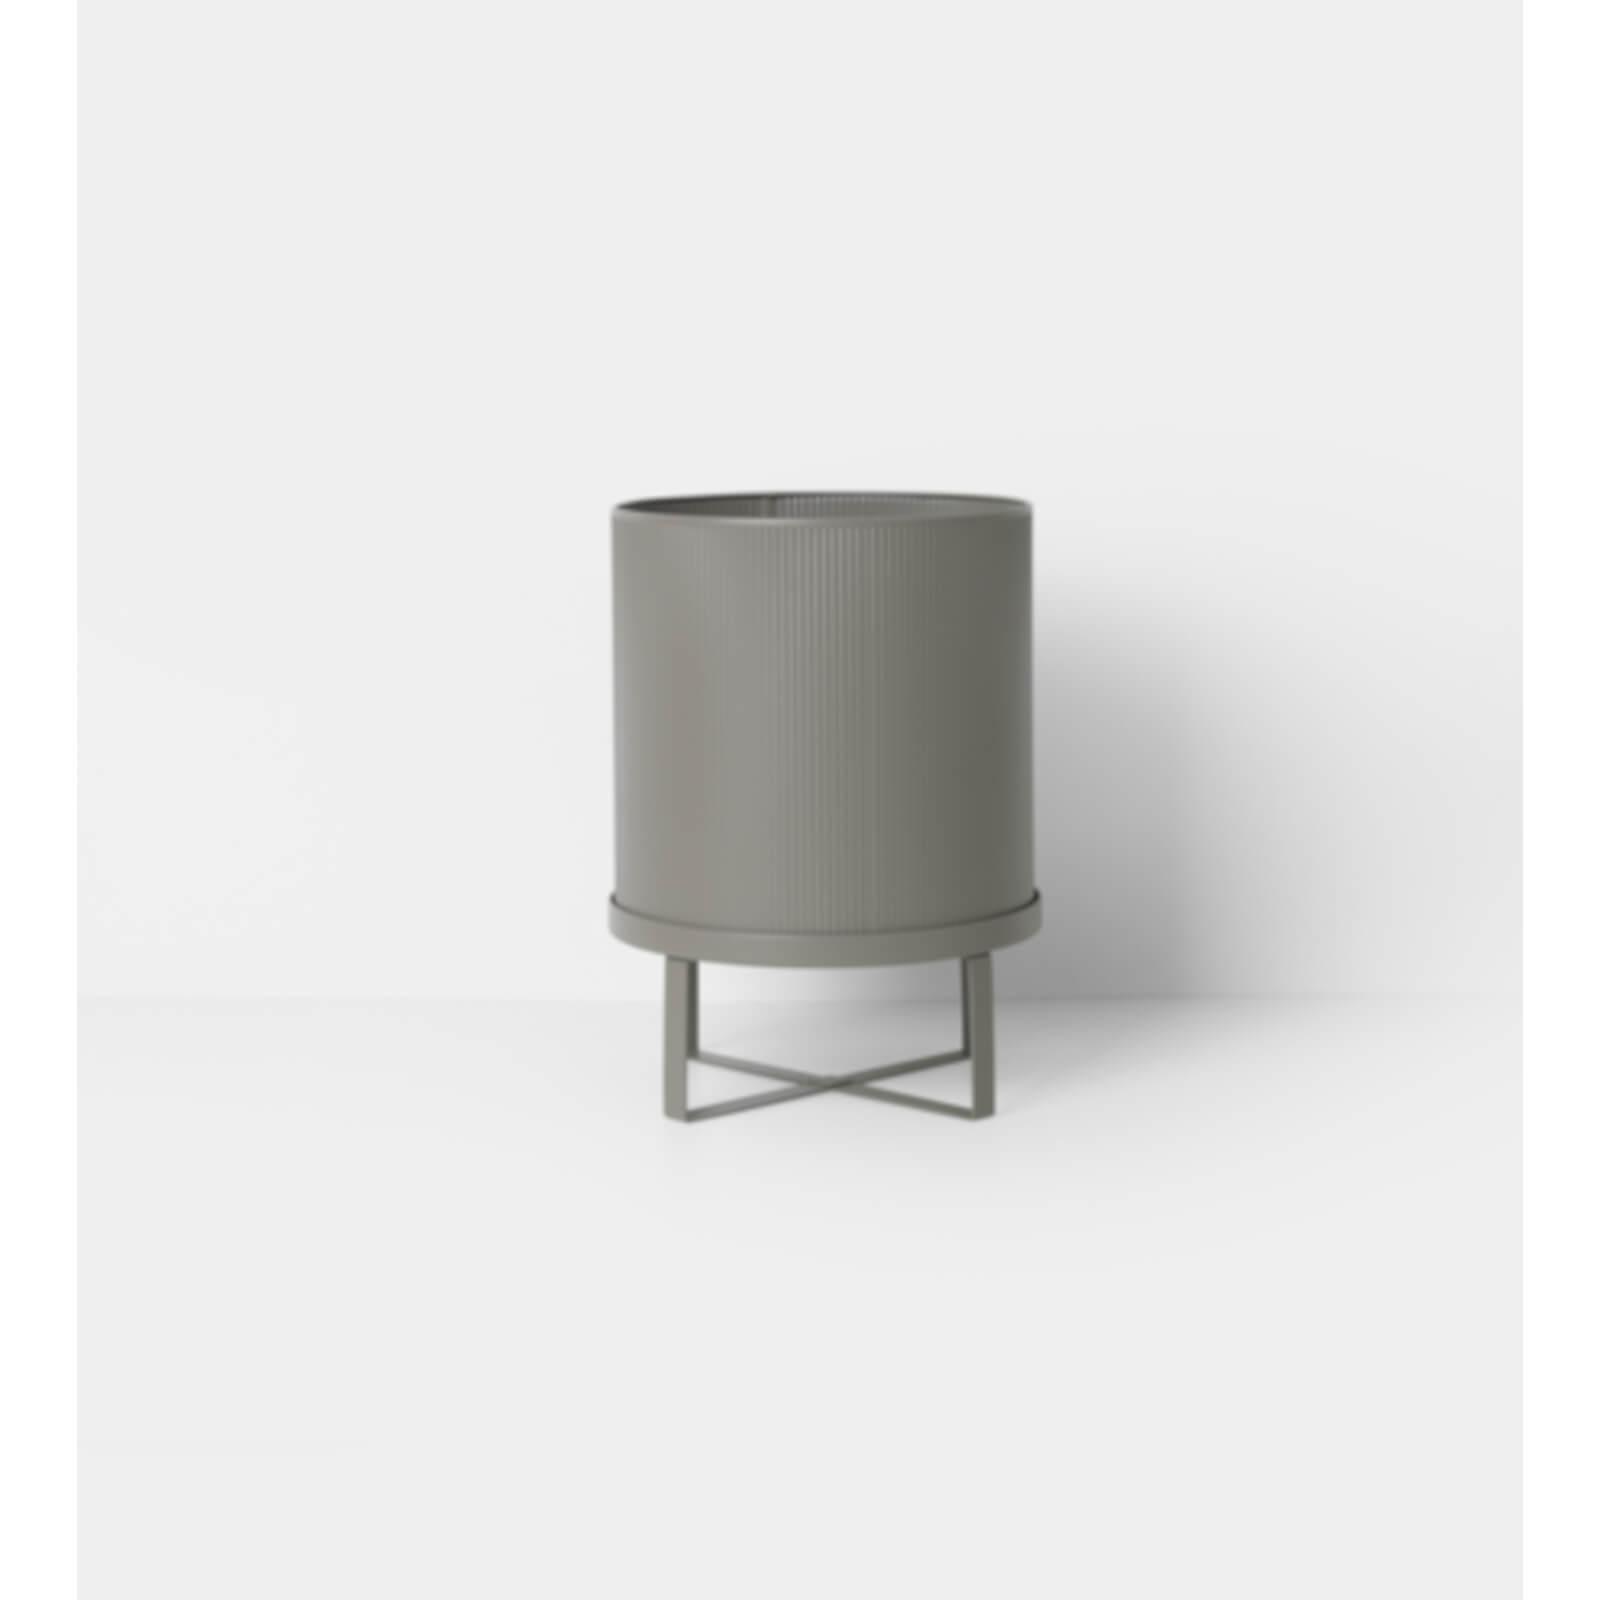 Ferm Living Bau Pot - Large - Warm Grey